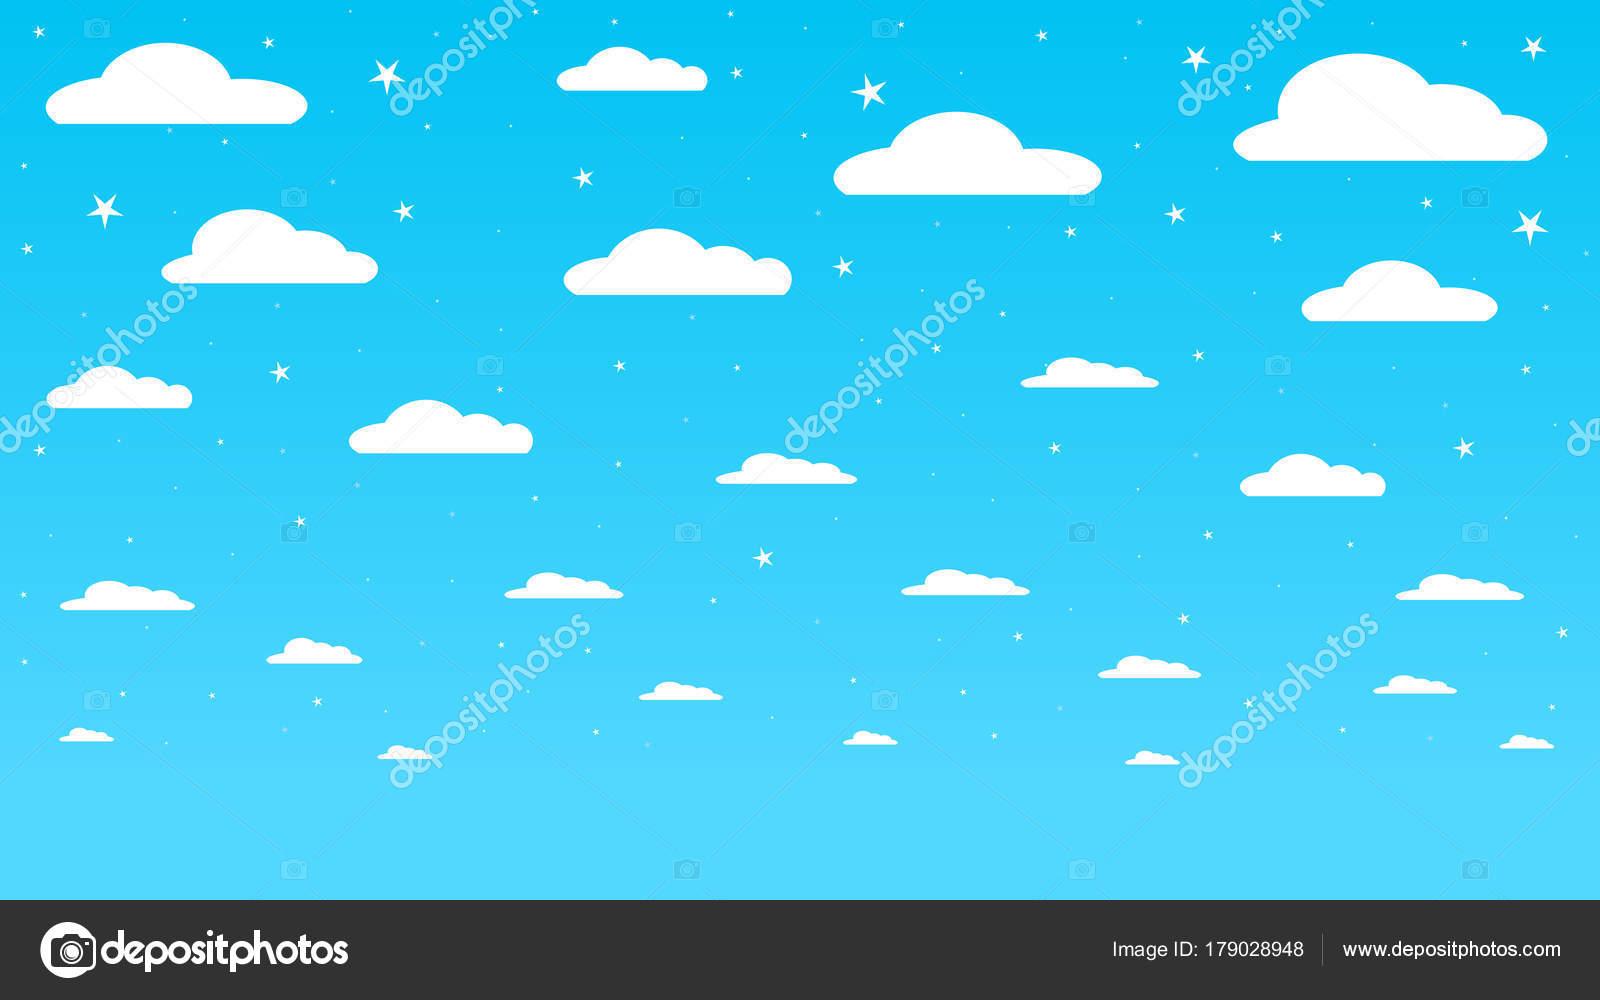 Dibujos: Estrellas Animadas Blancas